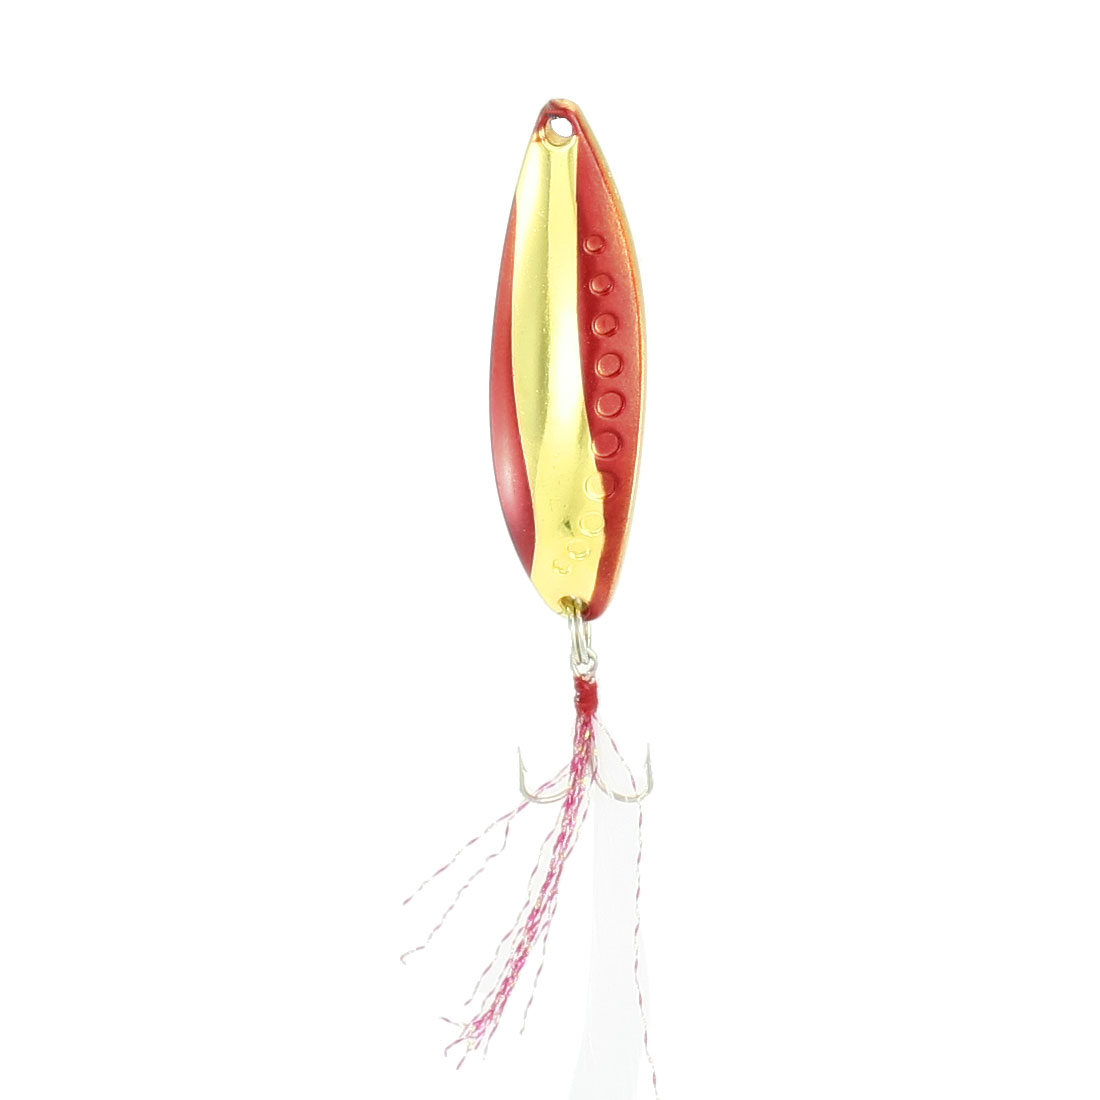 Metal Triple Hooks Artificial Leech Shape Fishing Lure